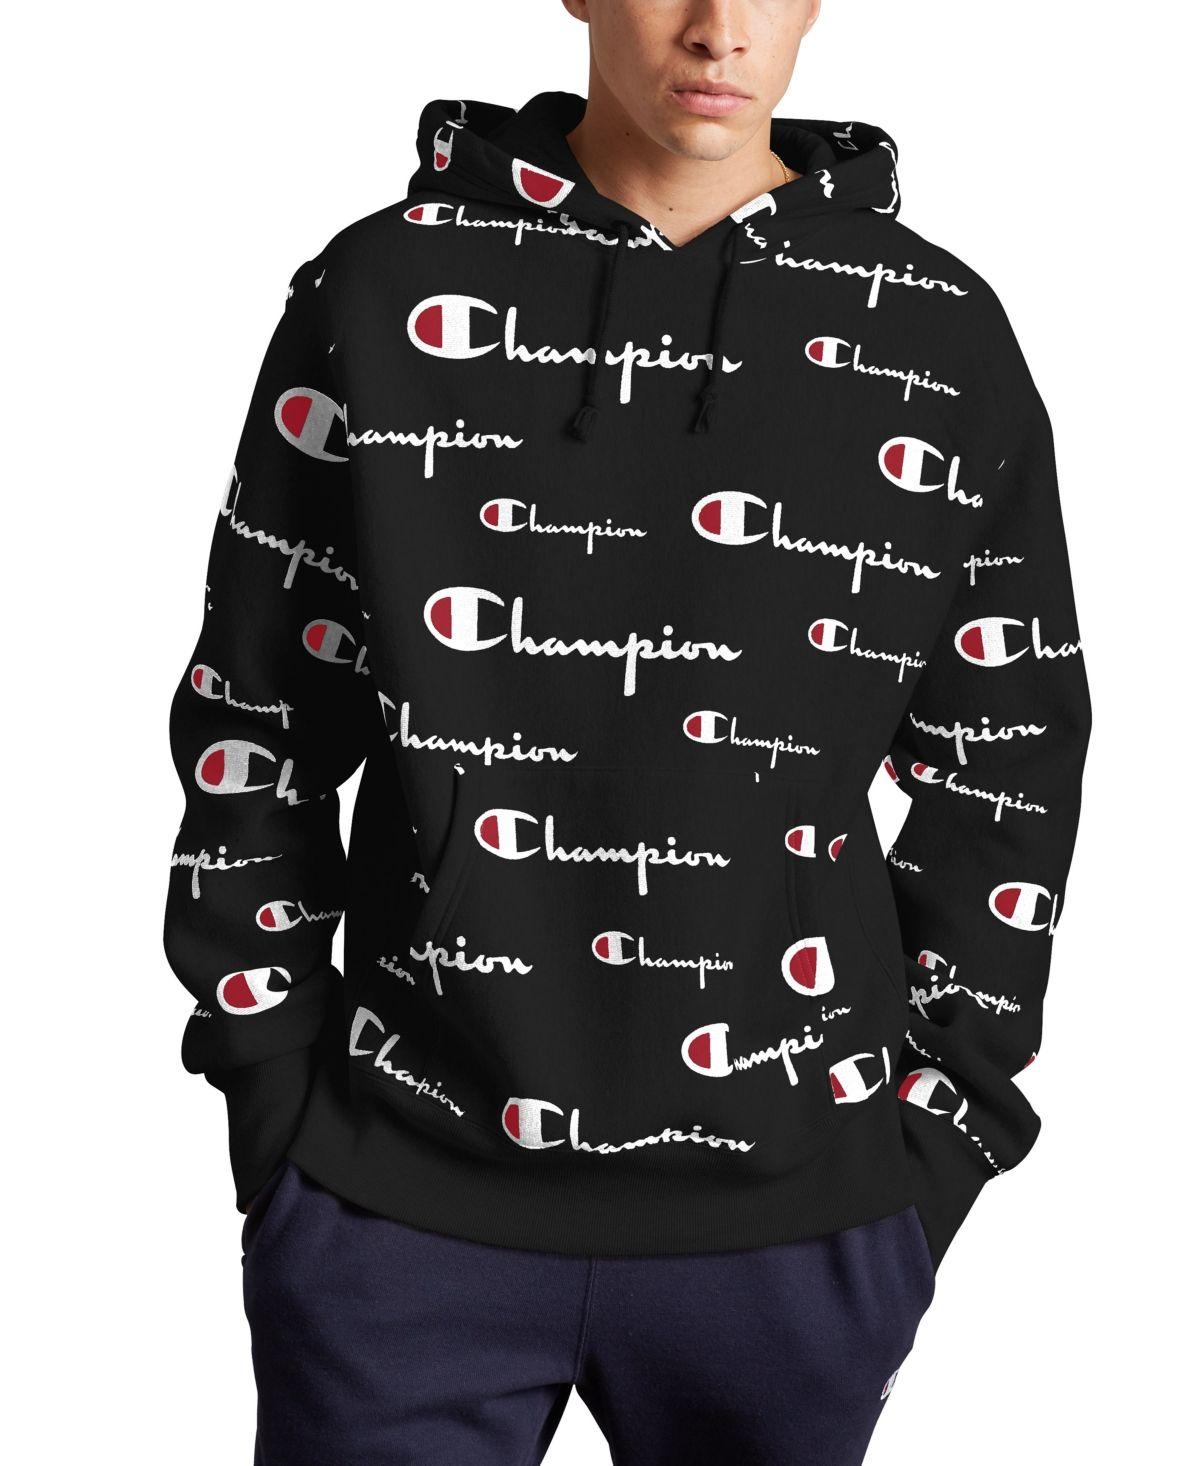 Pin By Error Fashions On Cute Clothes Hoodie Print Champion Clothing Hoodies Men [ 1466 x 1200 Pixel ]